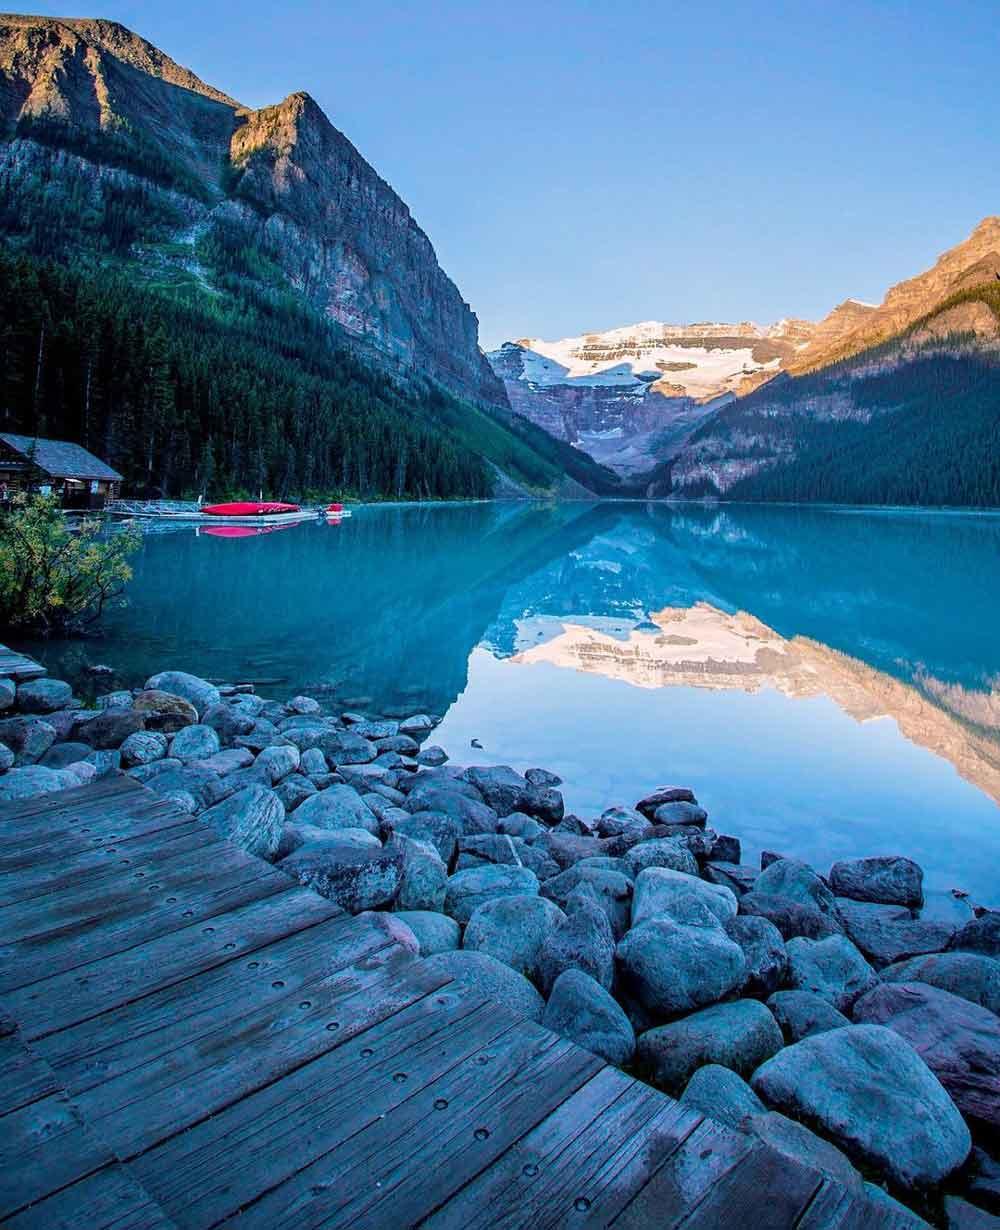 Lake Louise, Alberta, Canada - Photographer @magpie_n_moo / Michèle Thompson